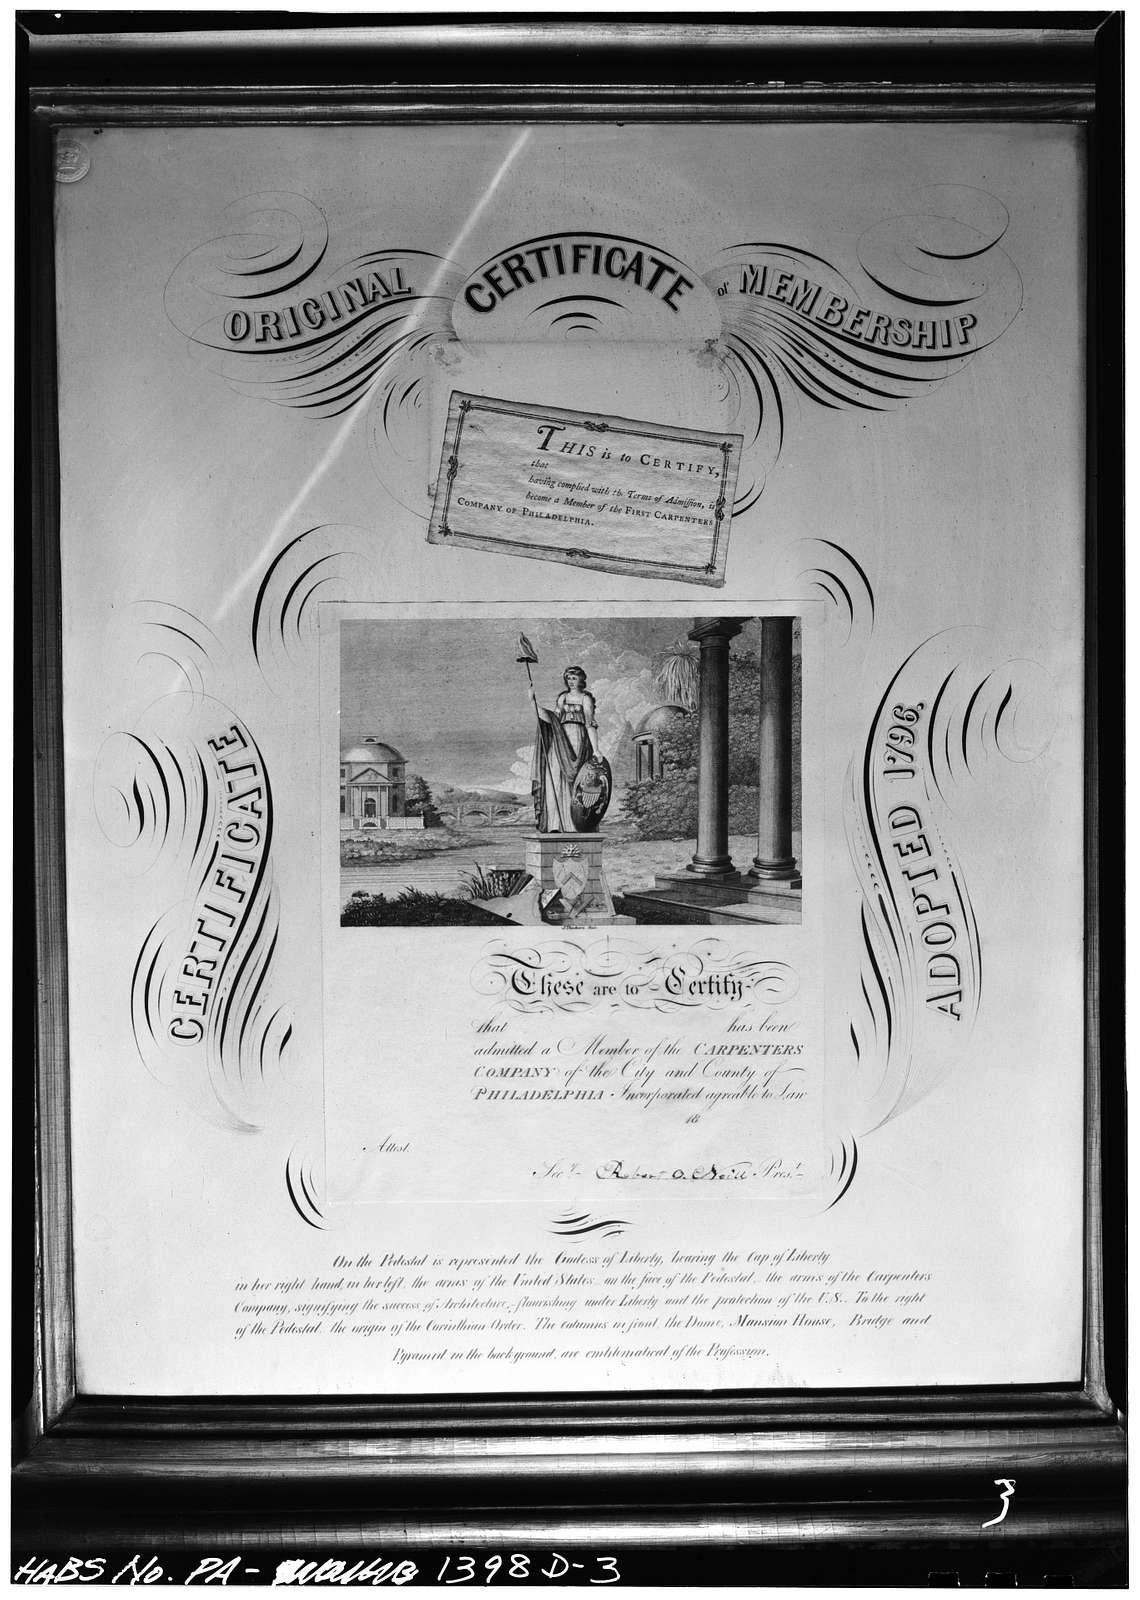 Carpenters' Company, Rule Book (carpentry manual), Philadelphia, Philadelphia County, PA